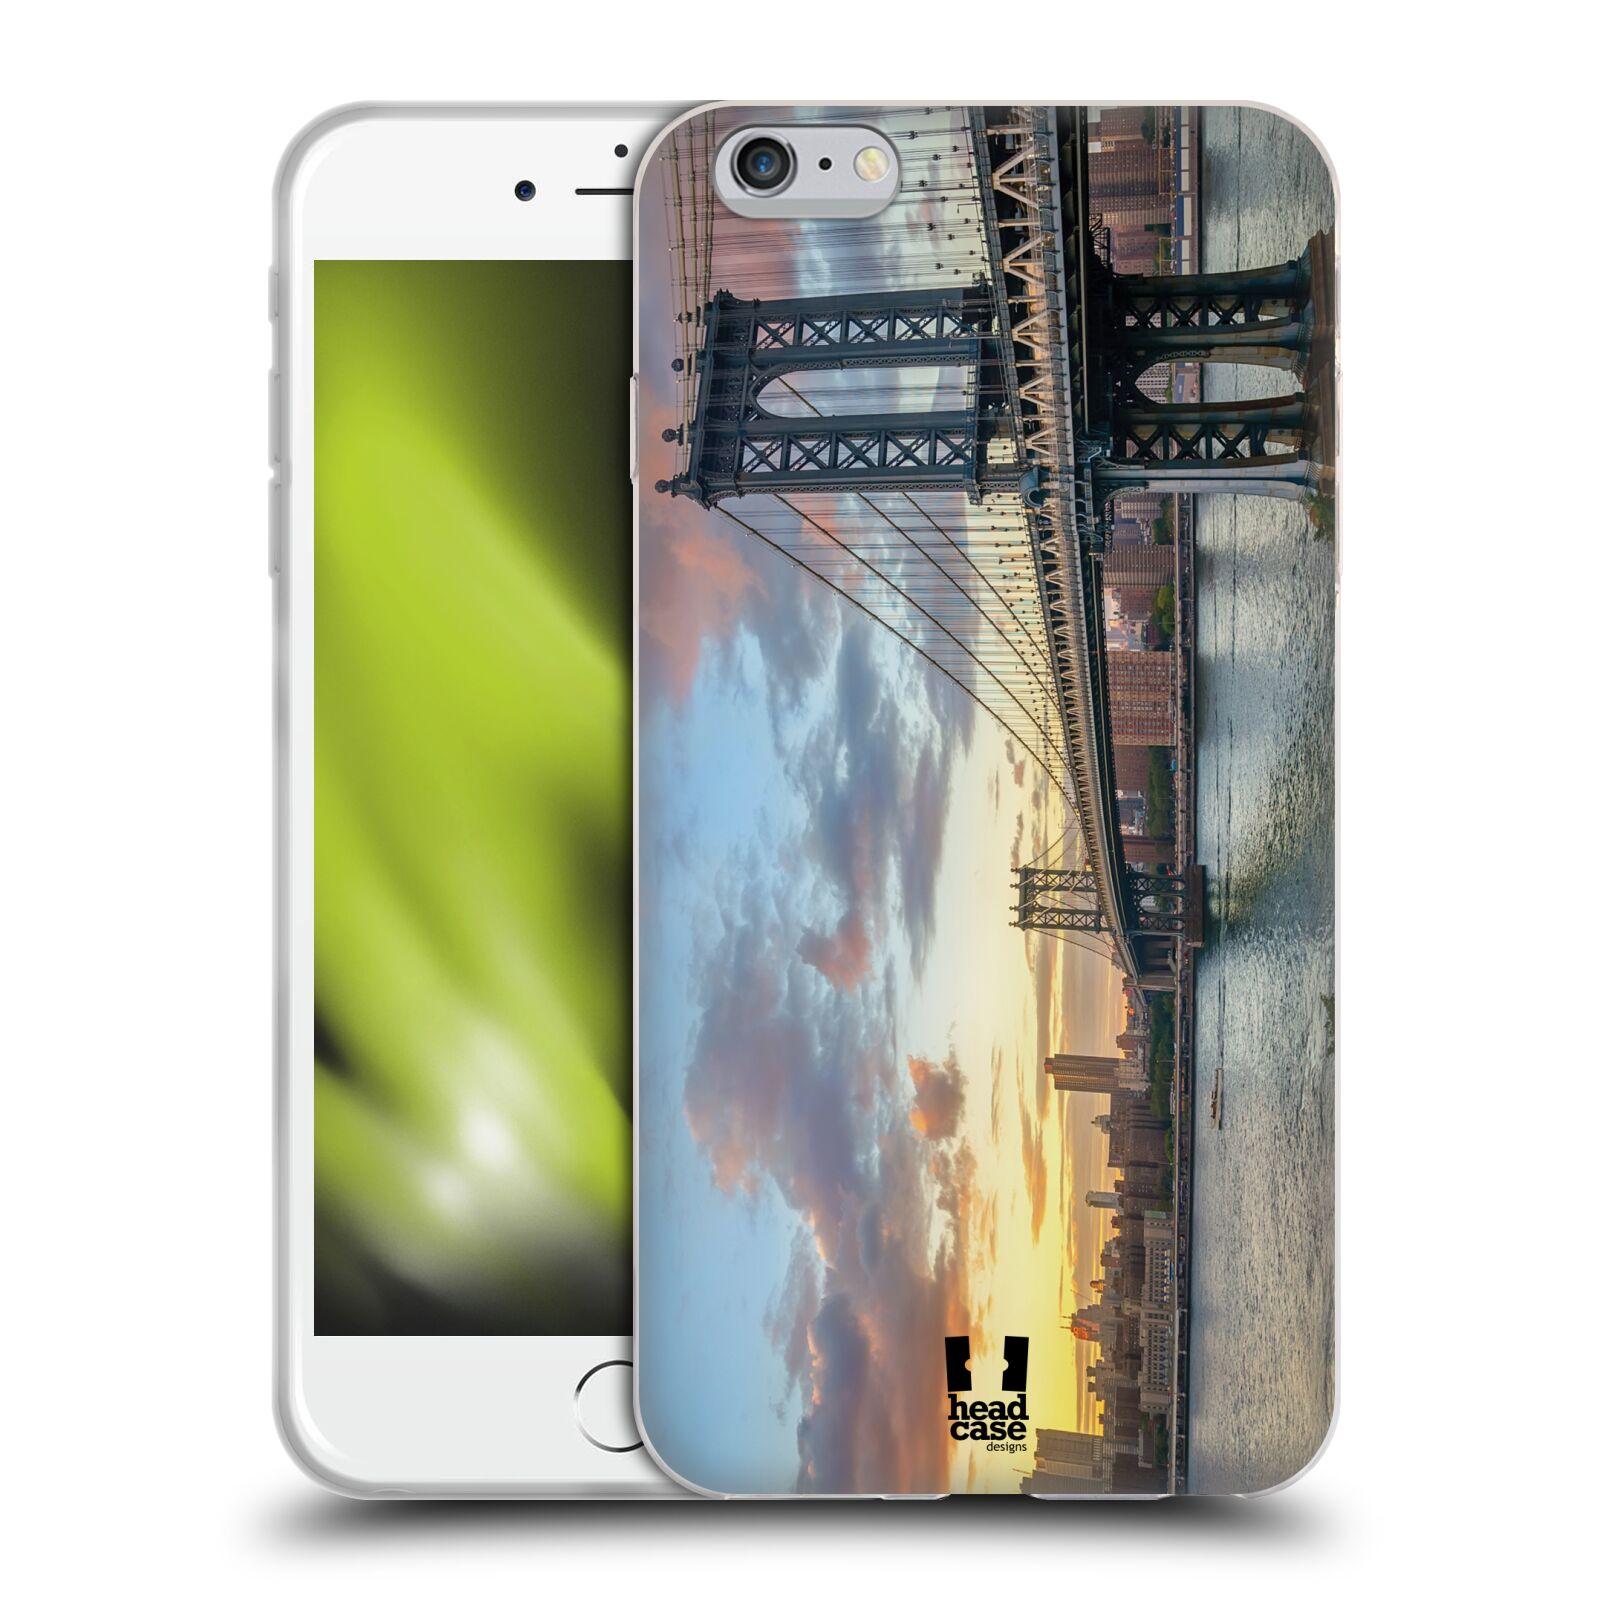 HEAD CASE silikonový obal na mobil Apple Iphone 6 PLUS  6S PLUS vzor  Panoramata měst horizontální foto MANHATTAN MOST ZÁPAD SLUNCE ef4433fd4ec